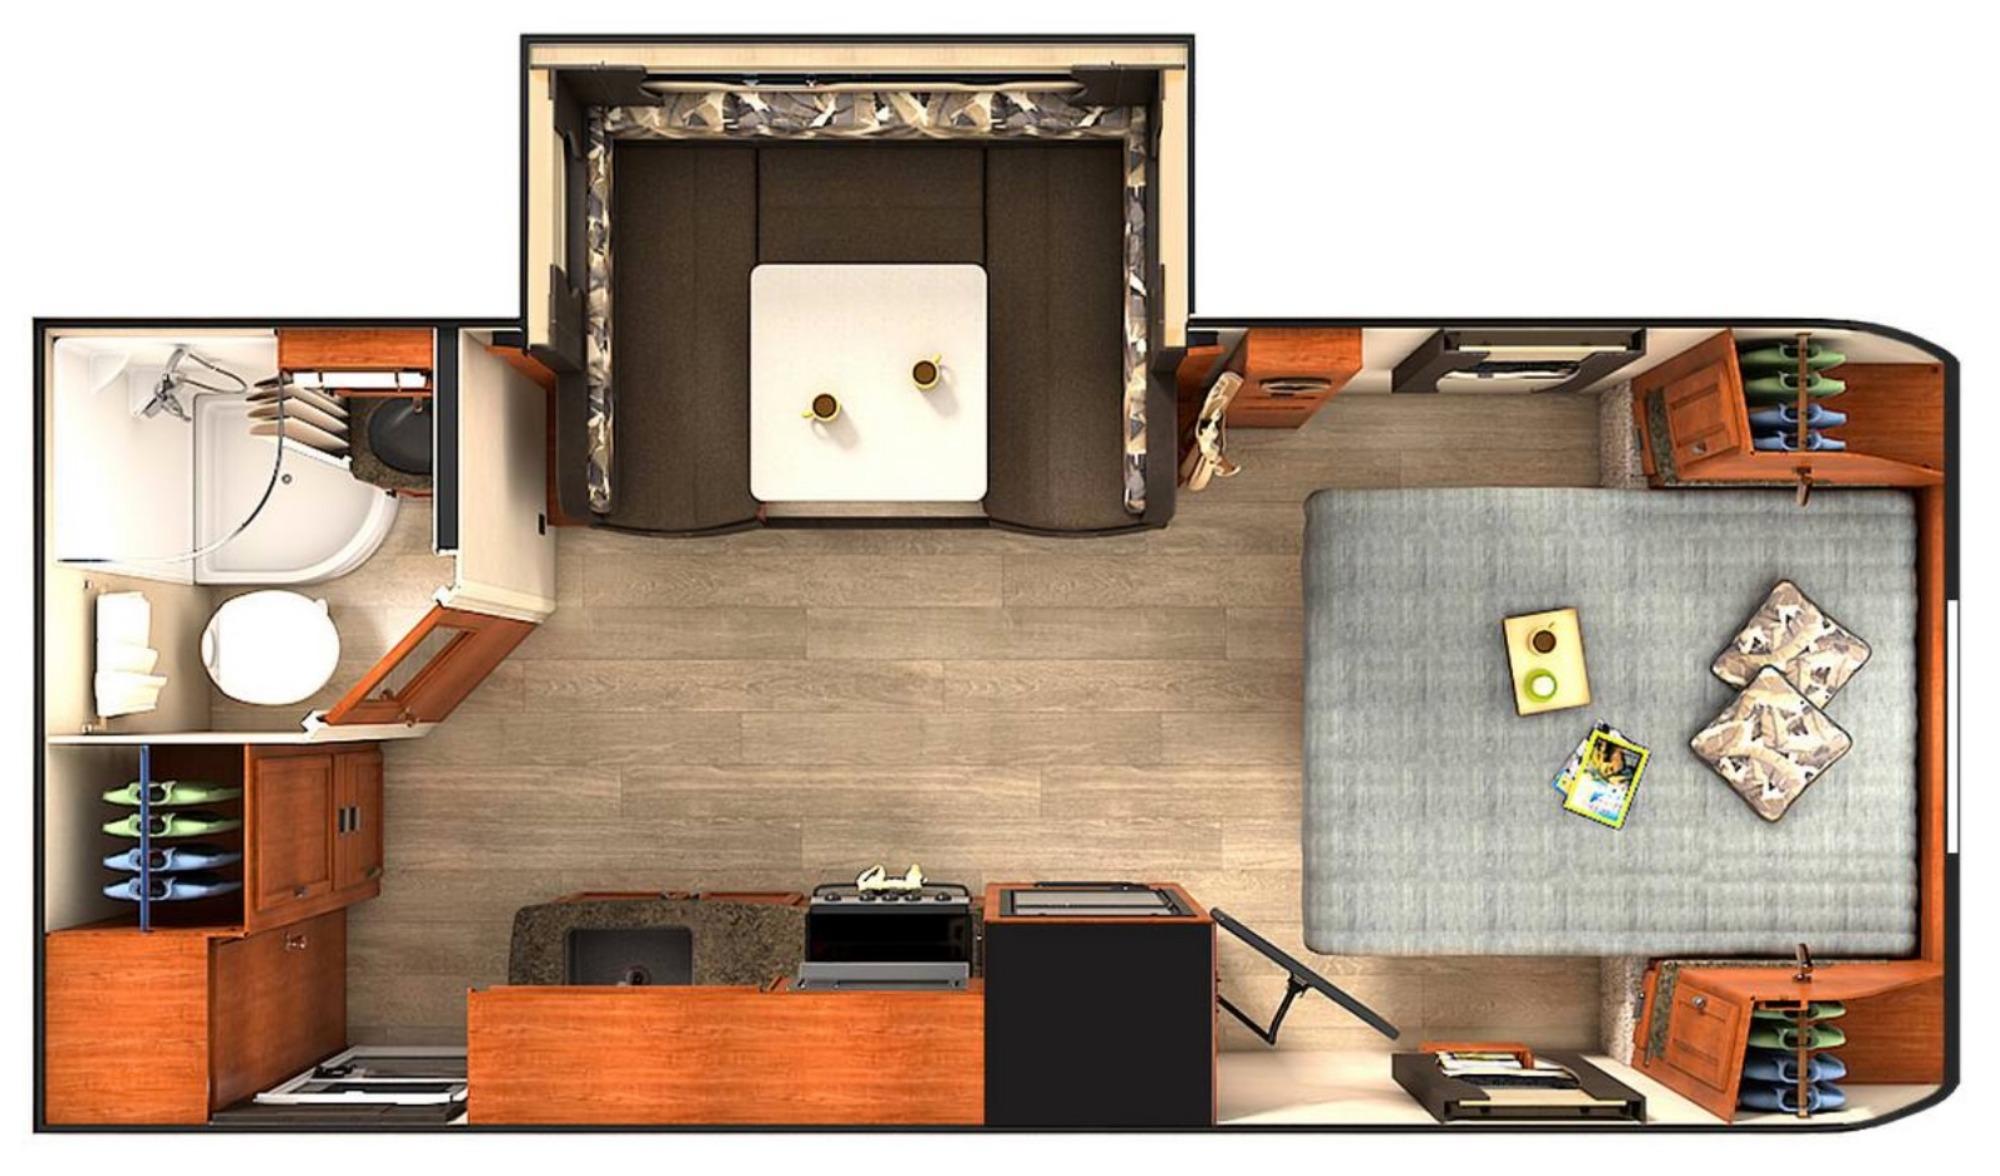 View Floor Plan for 2020 LANCE LANCE 1995